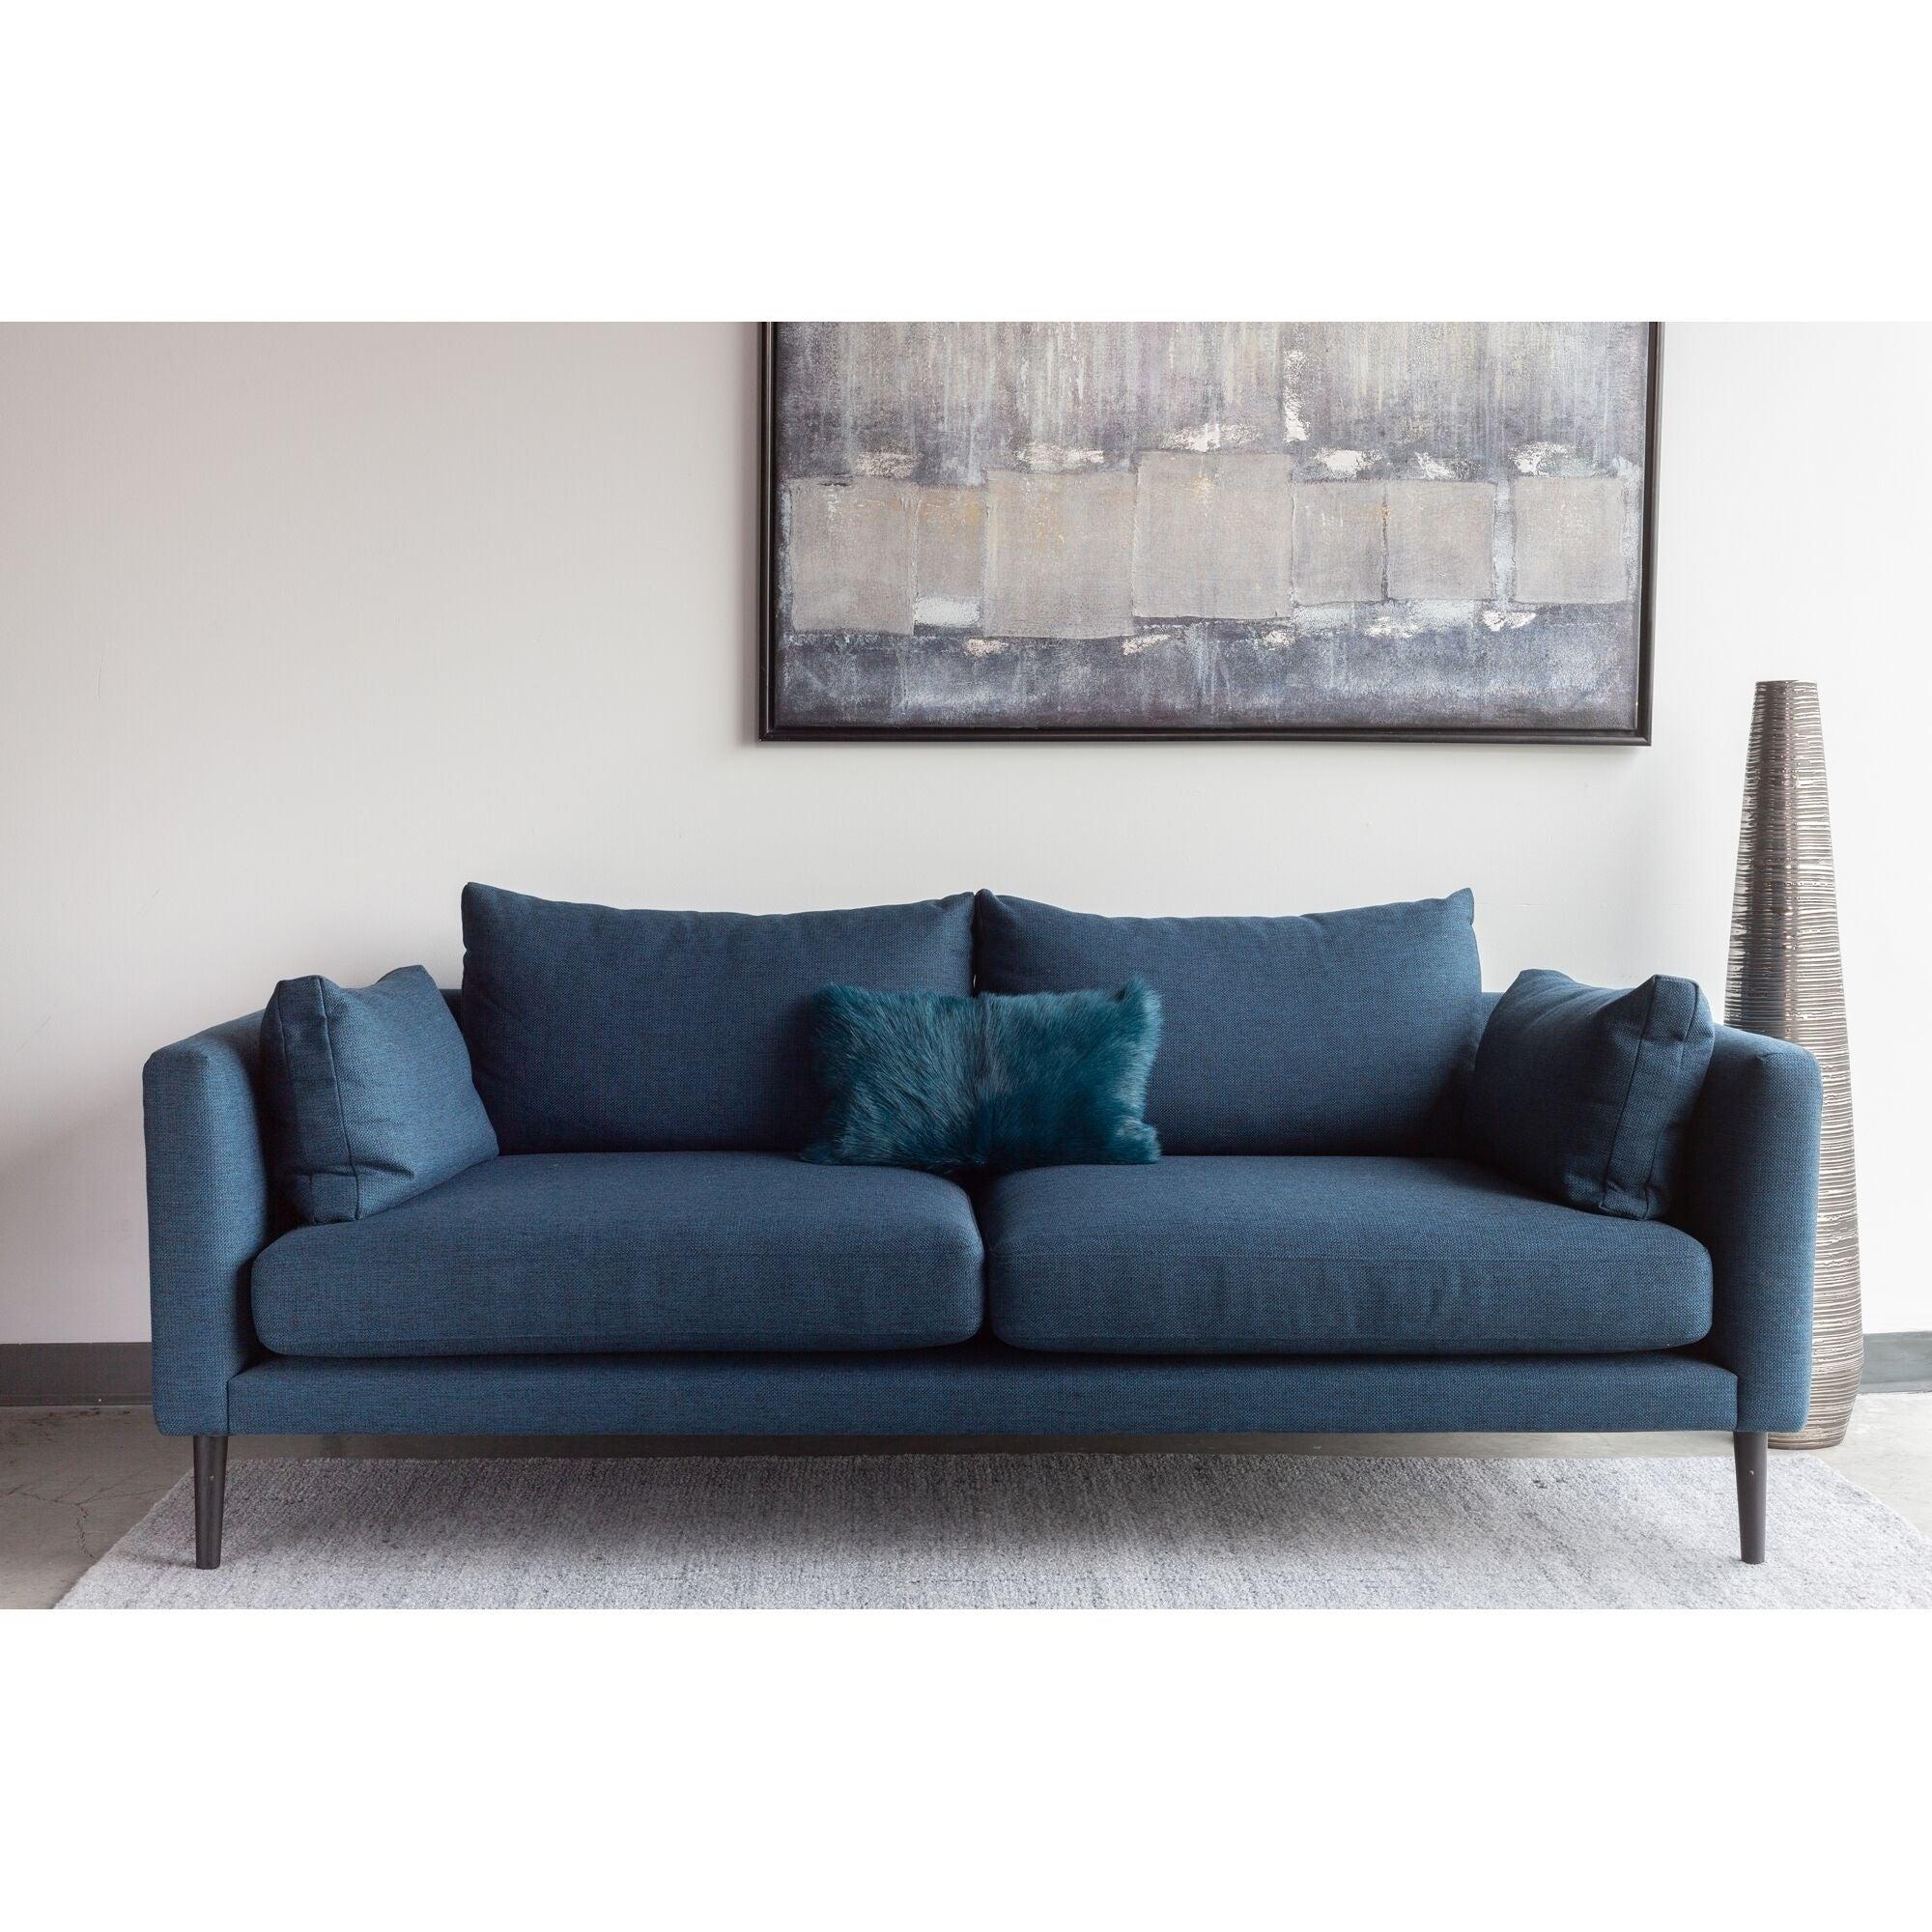 Brianna Scandinavian Modern Sofa